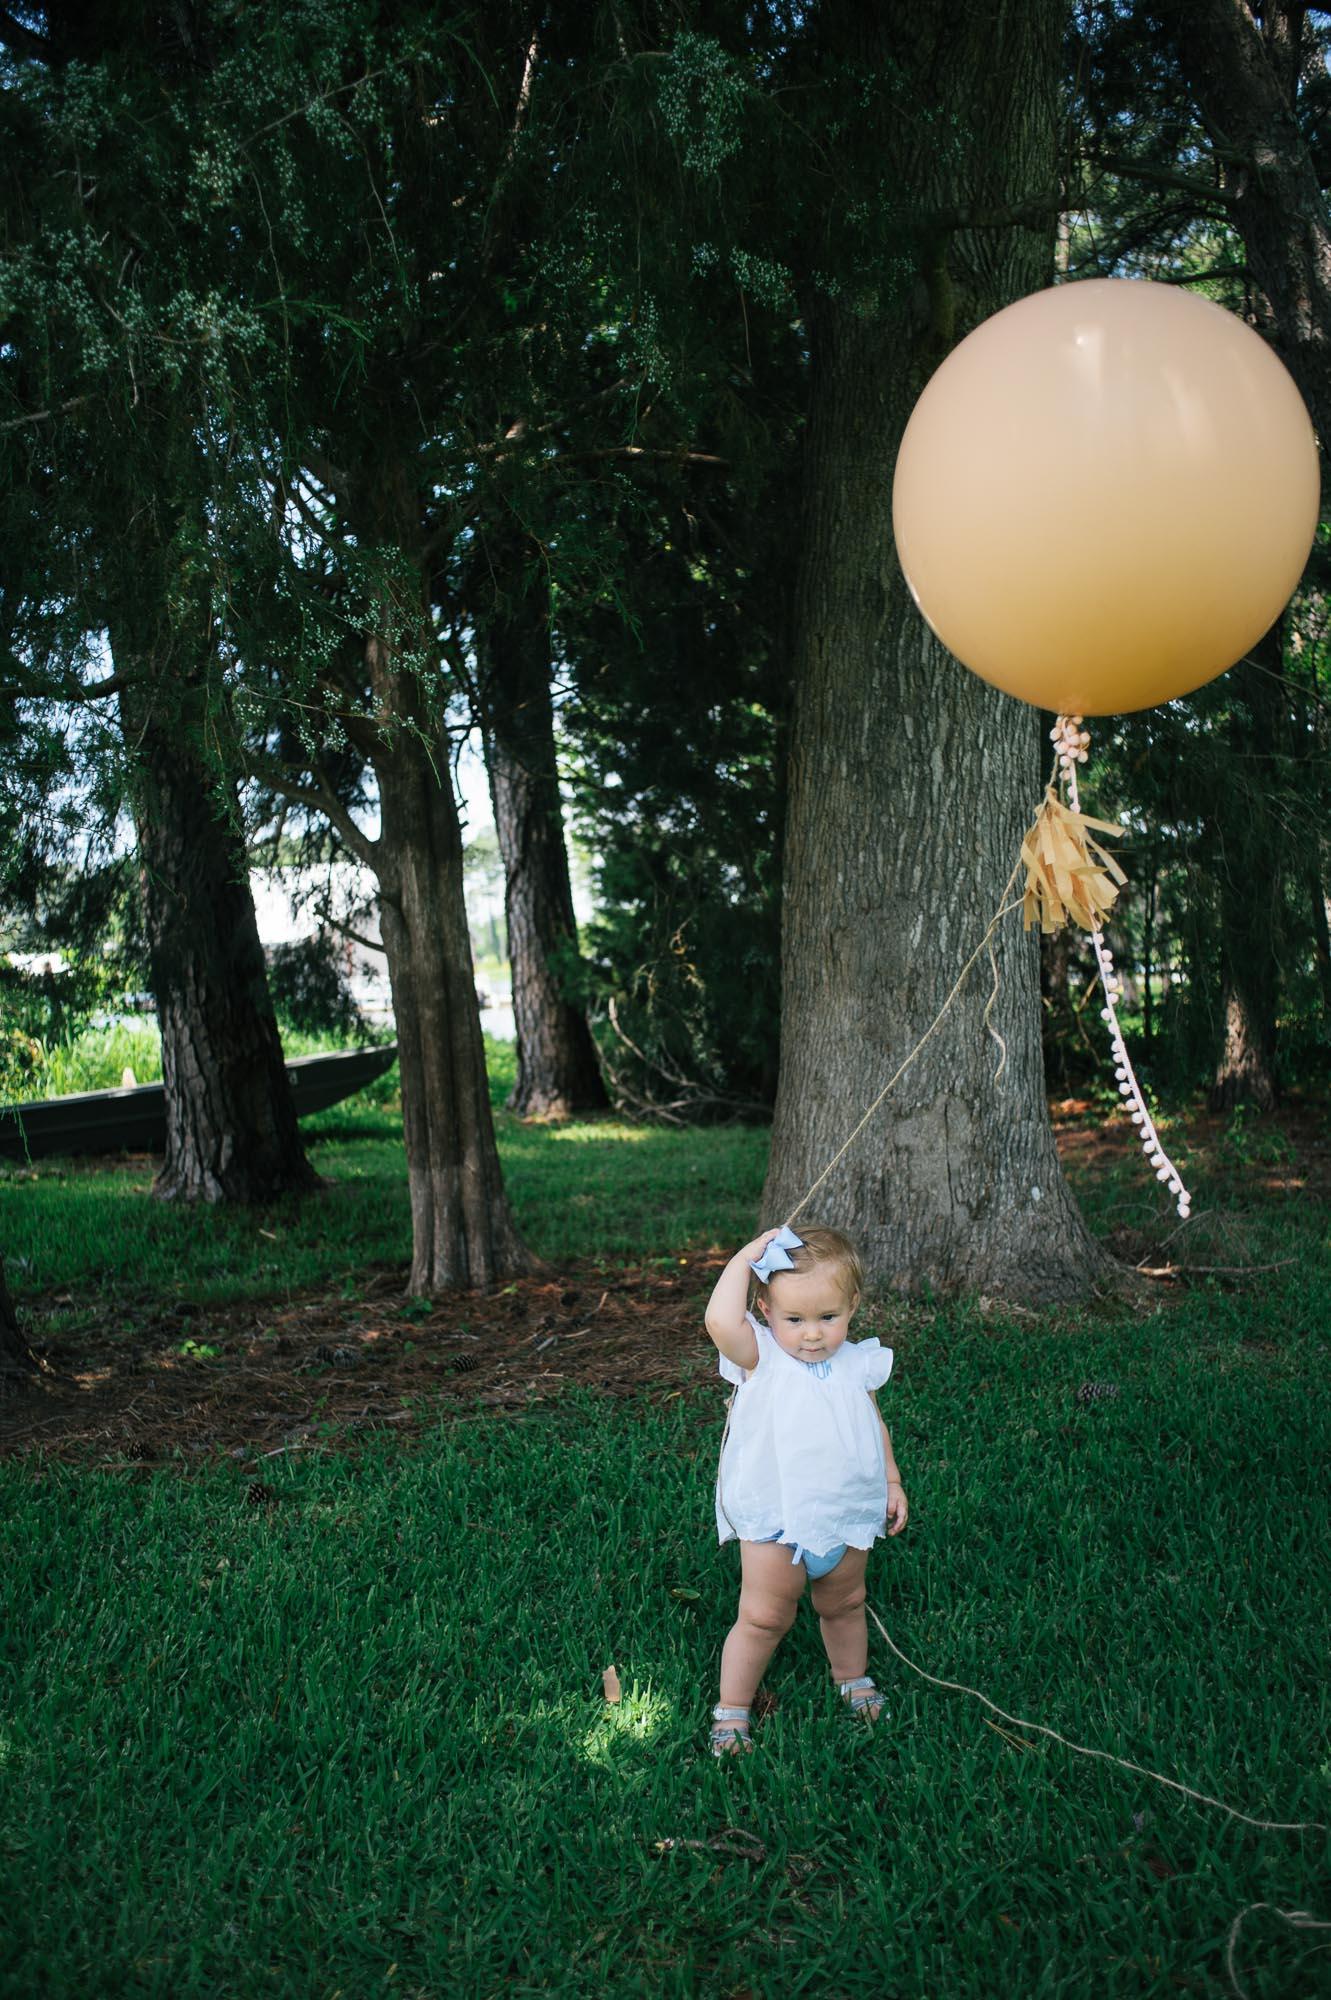 m.newsom-photography-one-year-old-girls-birthday-party-ideas-alice-in-wonderland (24 of 42).jpg